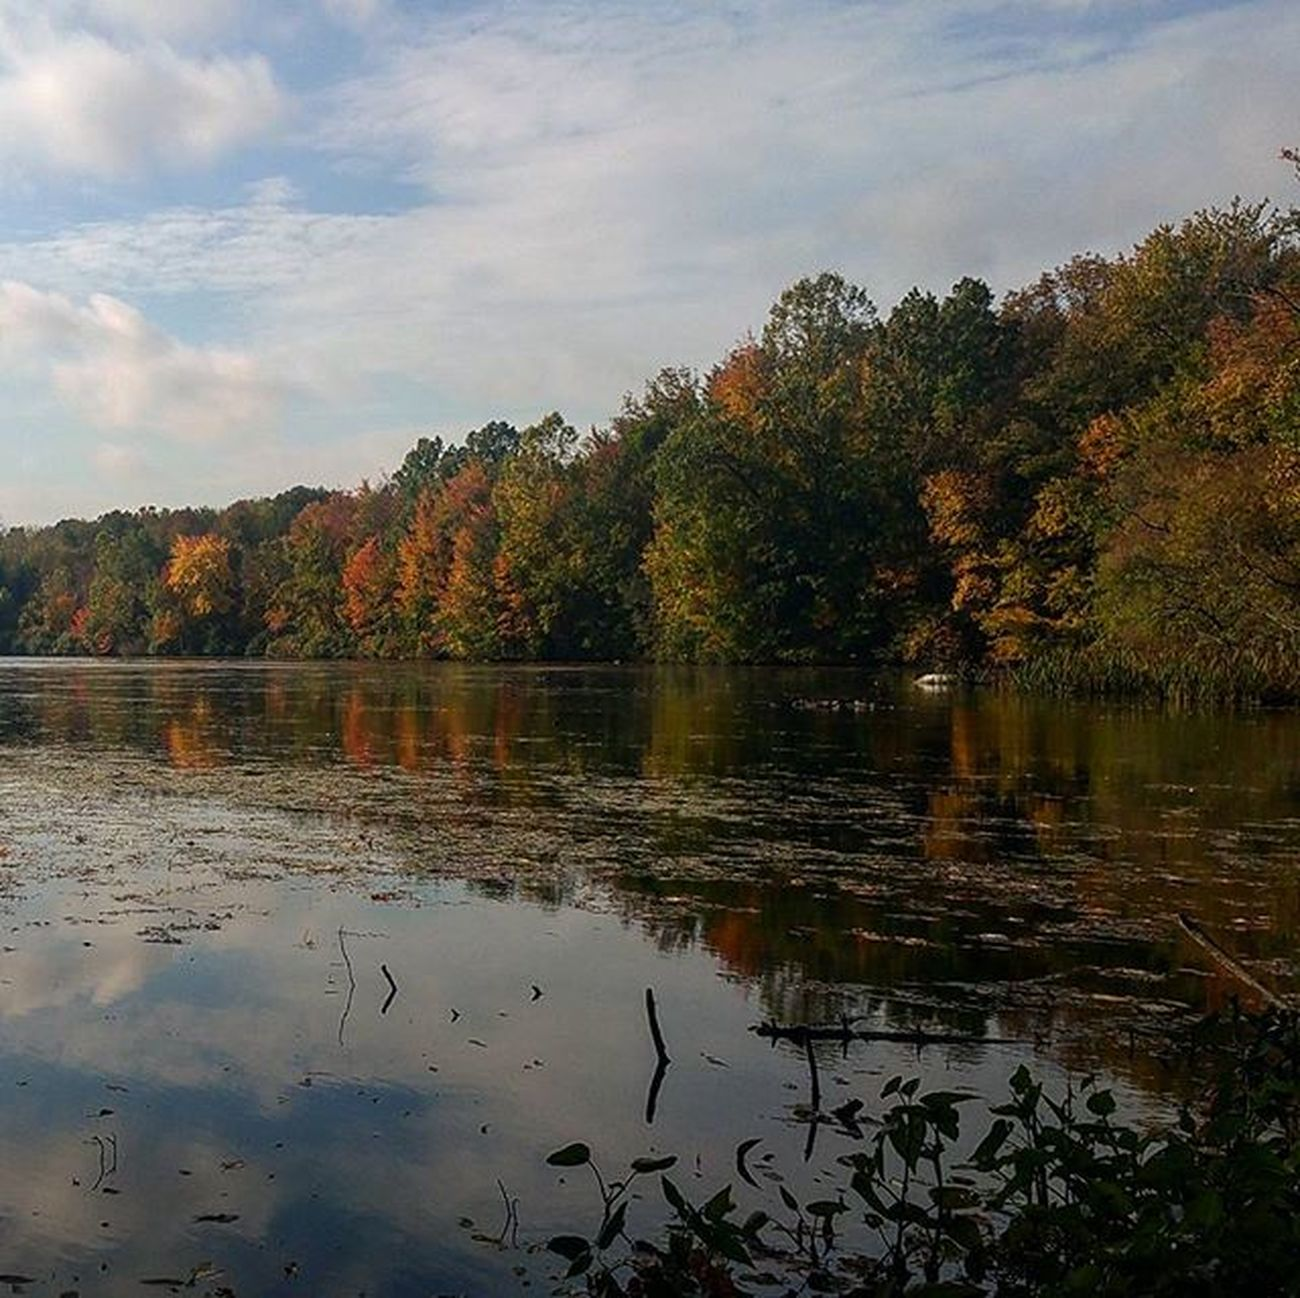 Beautiful fall day Ilovefall Reflections Autum Naturesbeauty Lakenockamixon Pennsylvania Fall Autumcolors Fallcolors